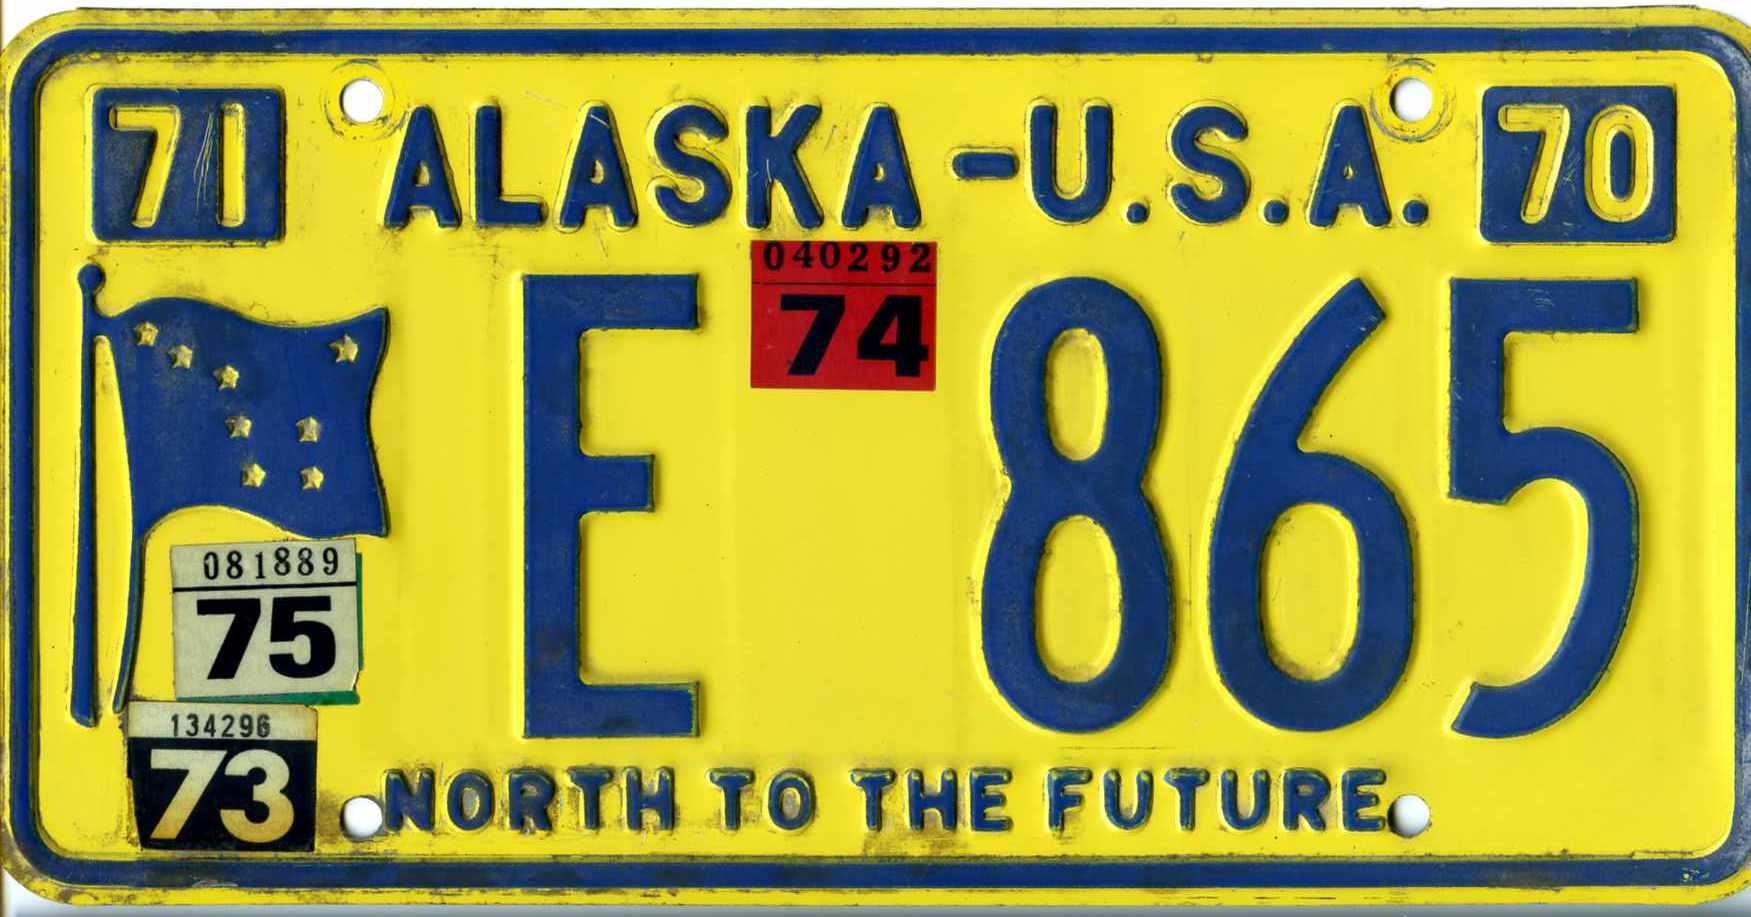 alaska Plate 1970 Sticker Wikipedia 1975 E Number License On - File 865 jpg